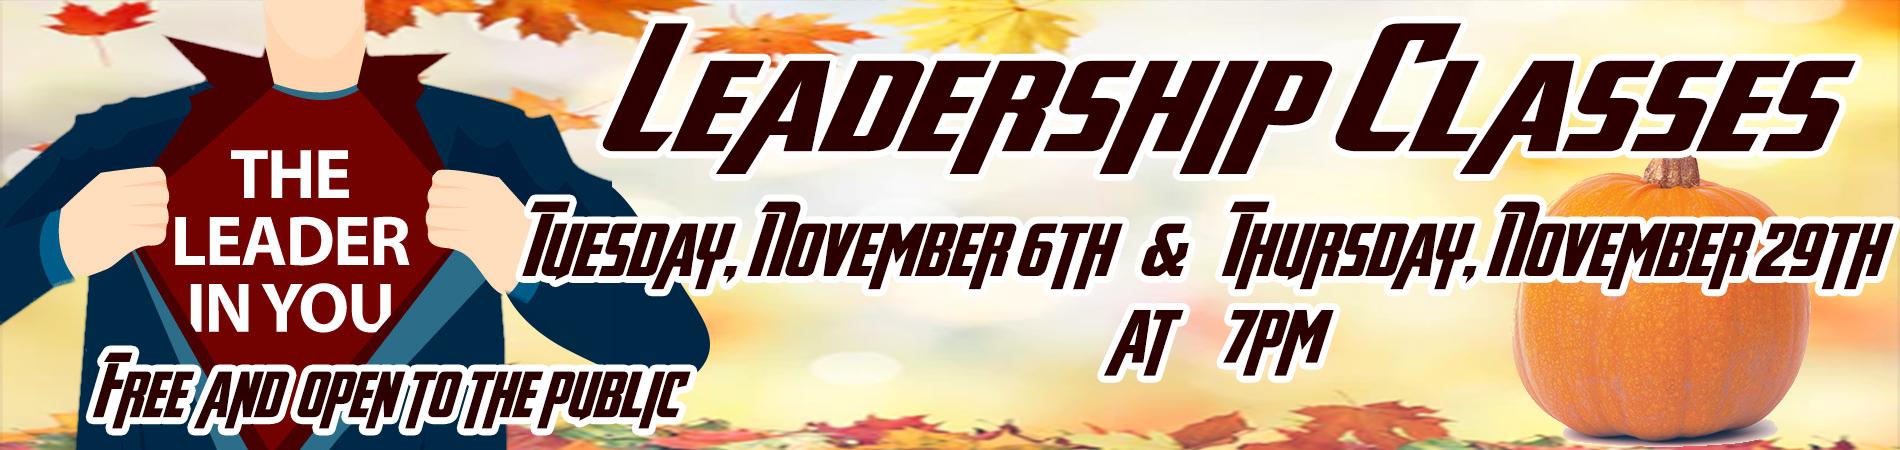 leadershipclass